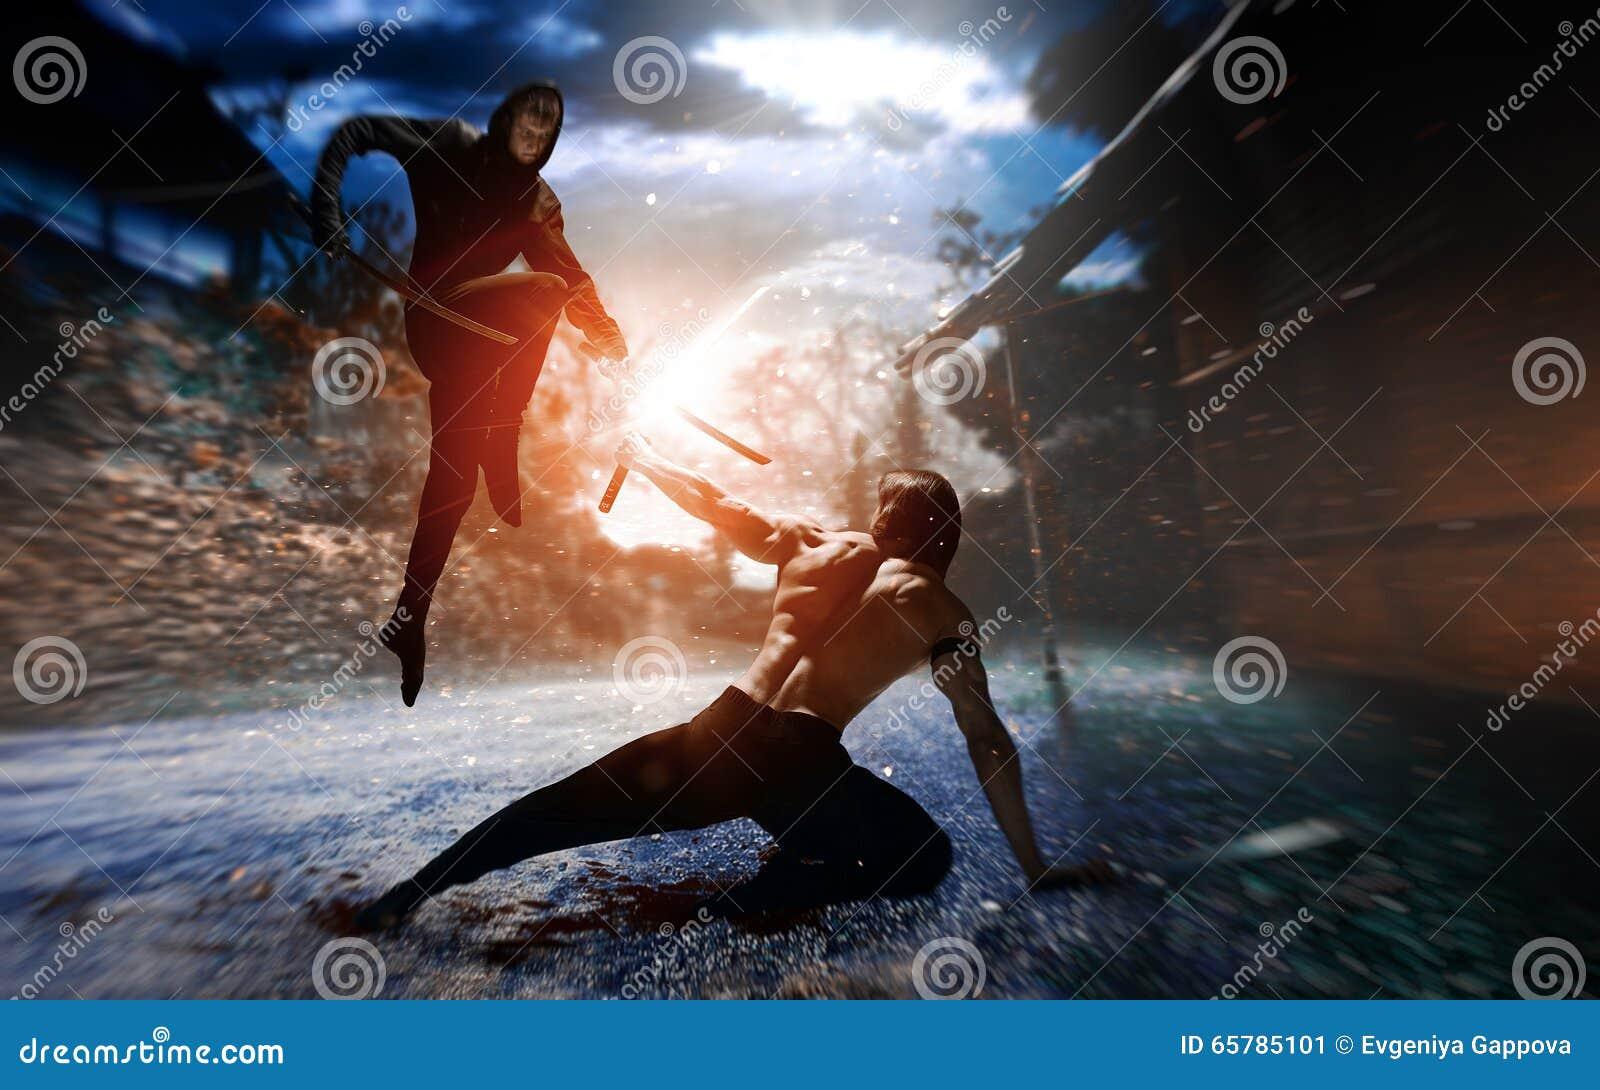 Fighter ninja with sword